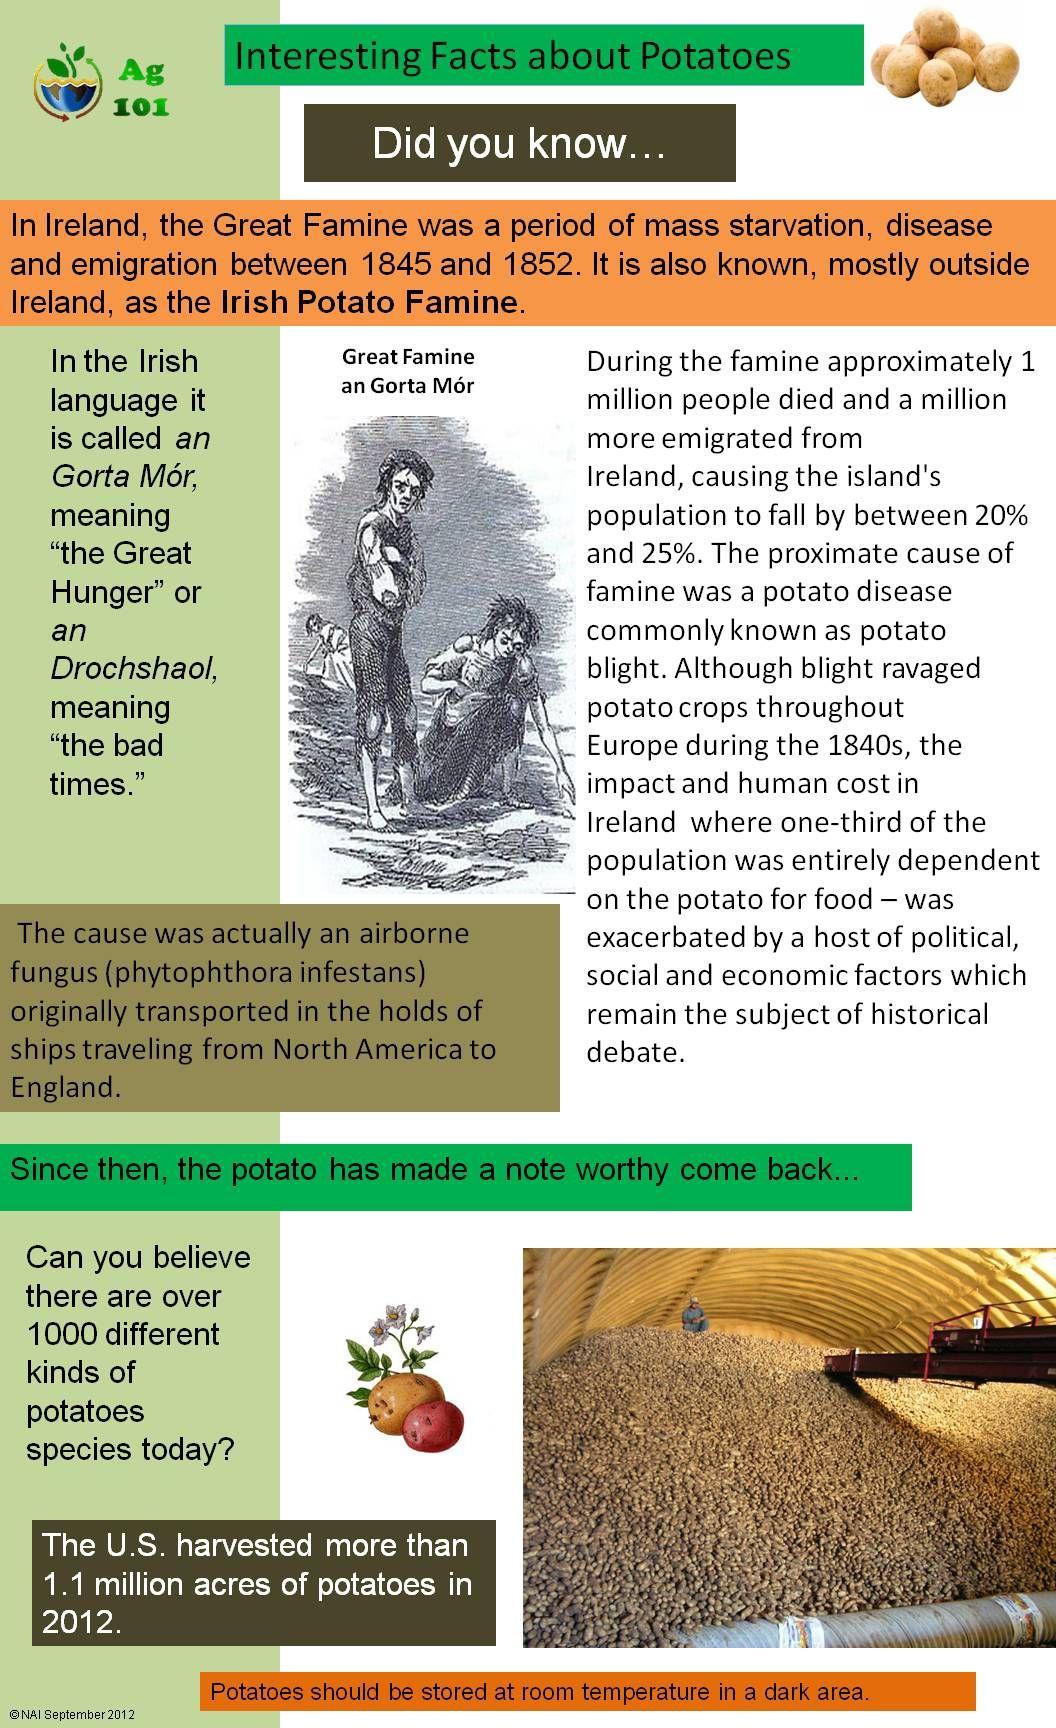 Irish Potato Famine